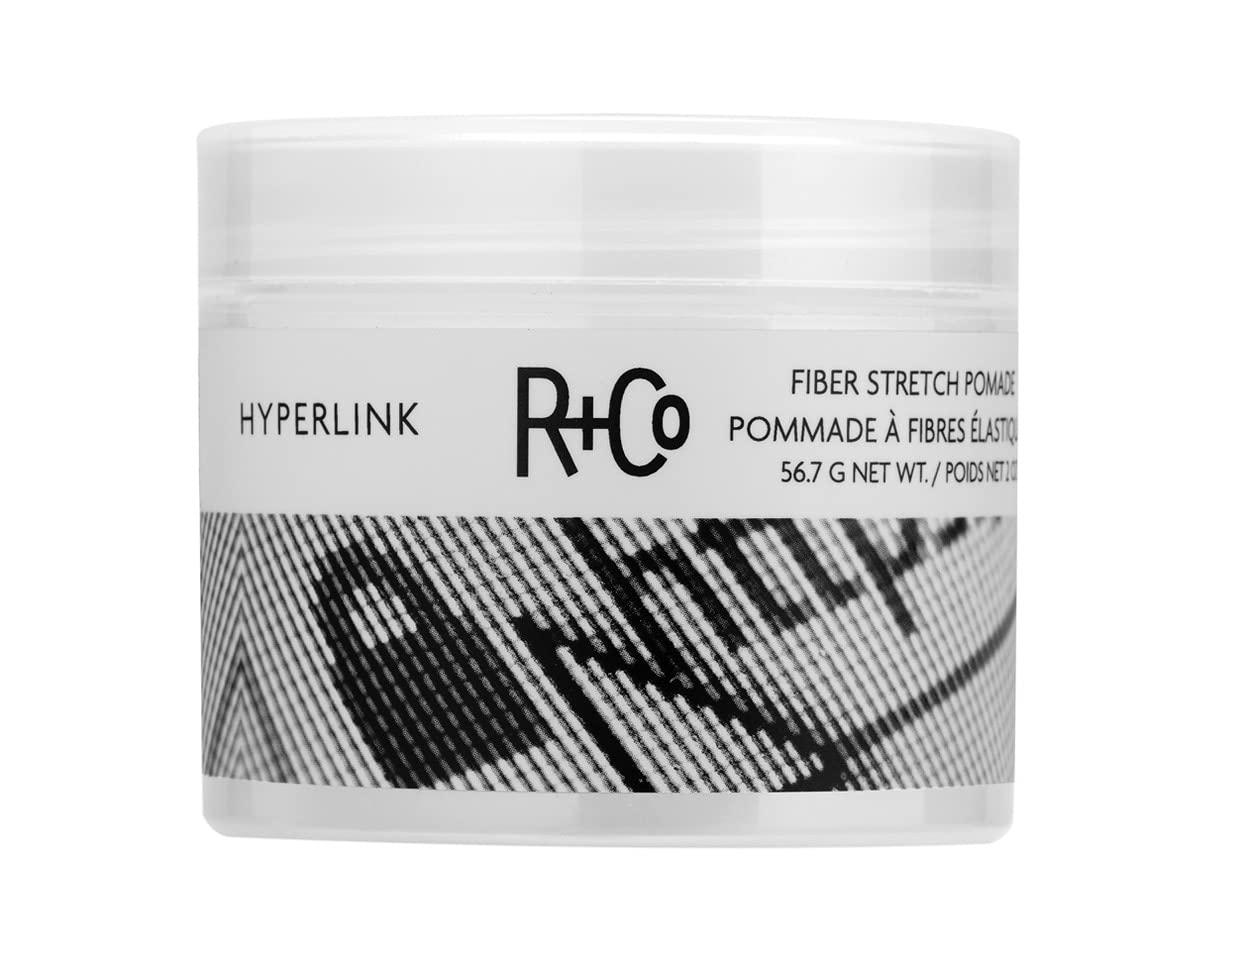 R+Co HYPERLINK Fiber Stretch Pomade, 2 oz.